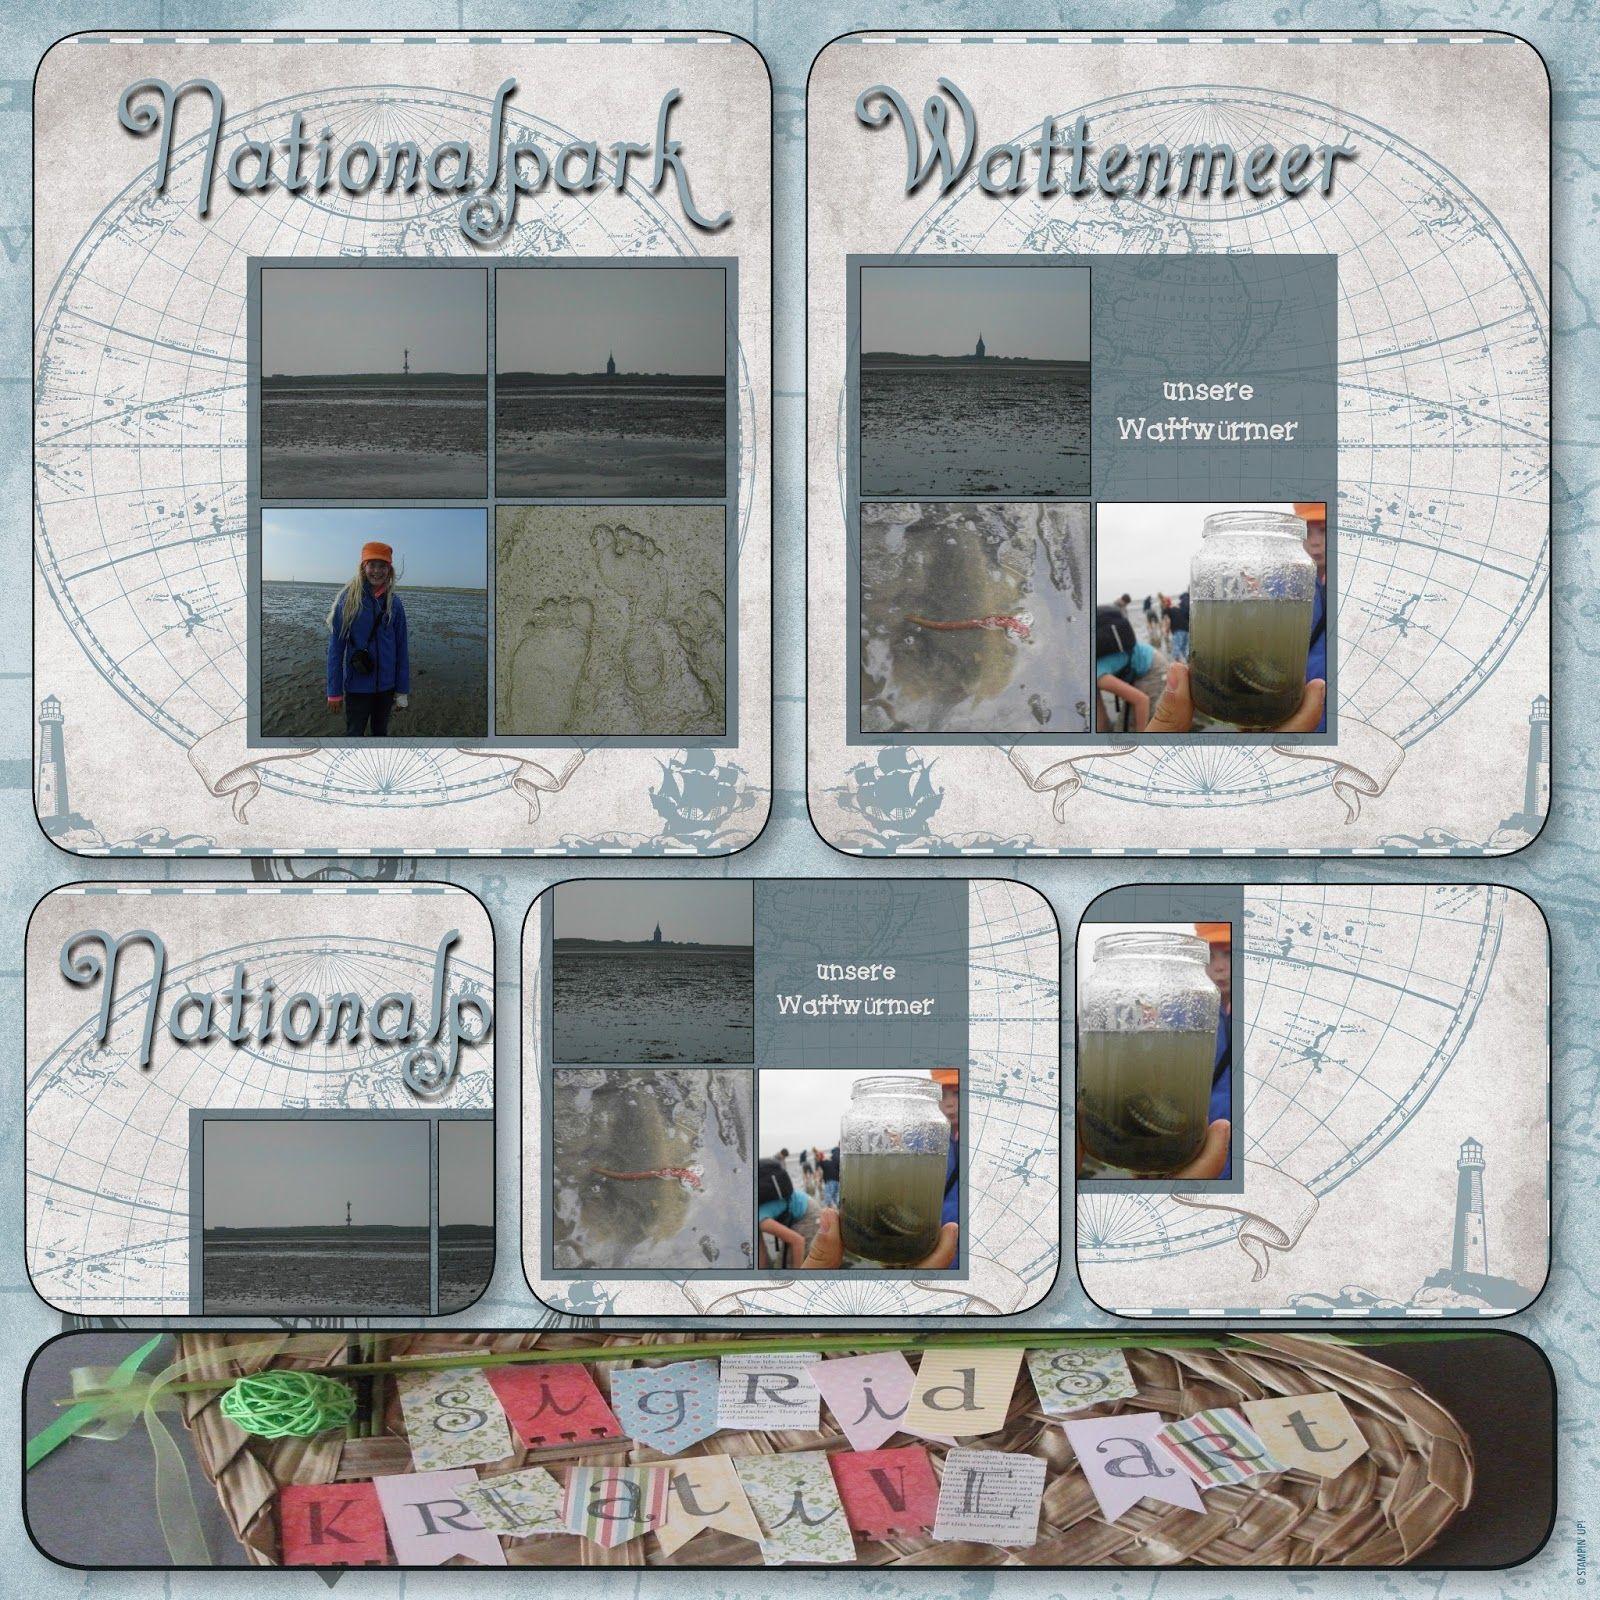 Sigrids kreative ART: Nationalpark Wattenmeer